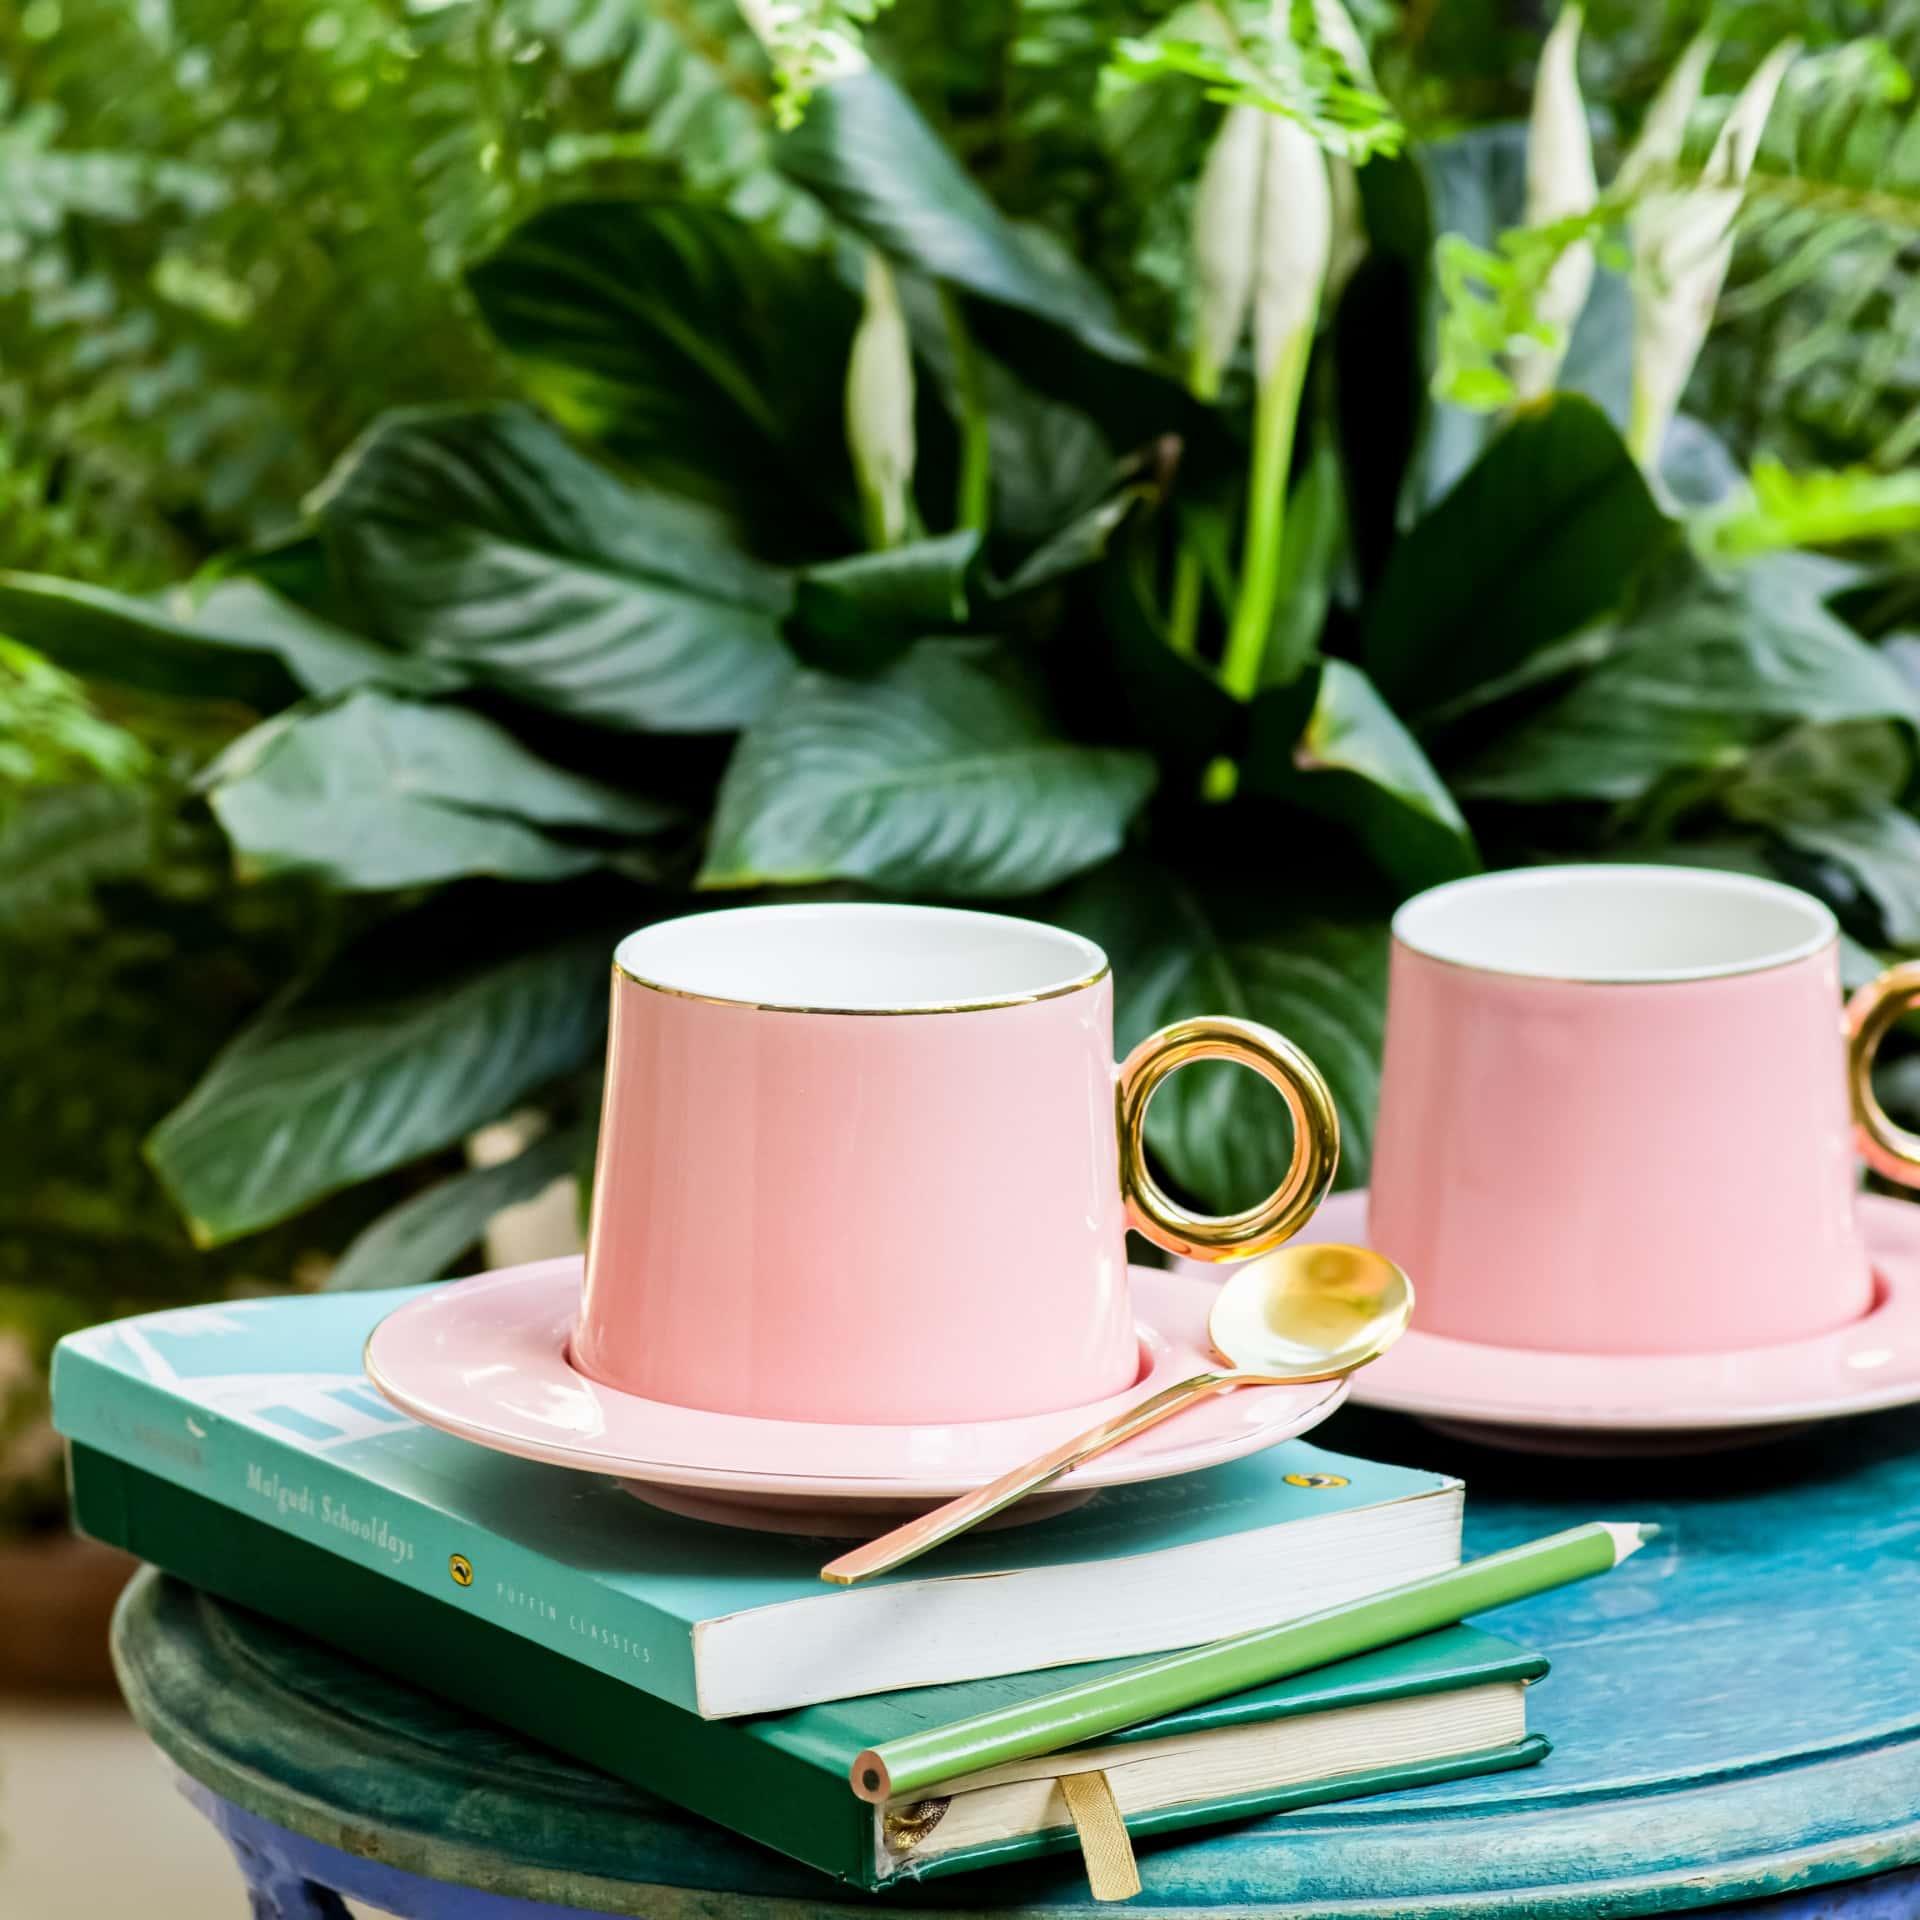 Viola Nordic Bliss Tea/Coffee Mug Set